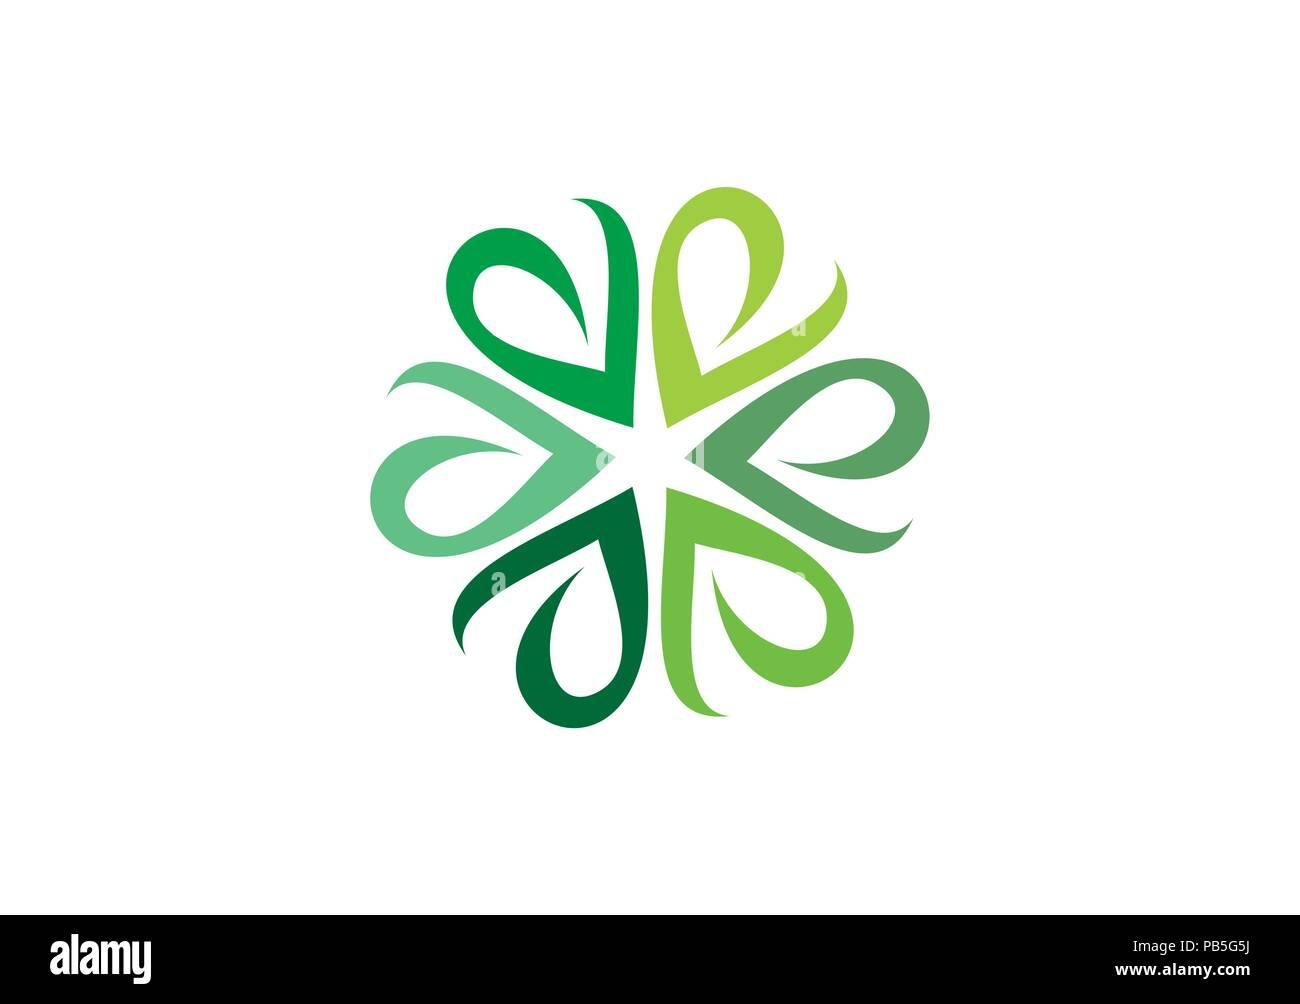 Circle Green Leaves Logo Ecological Herb Botany Symbol Natural